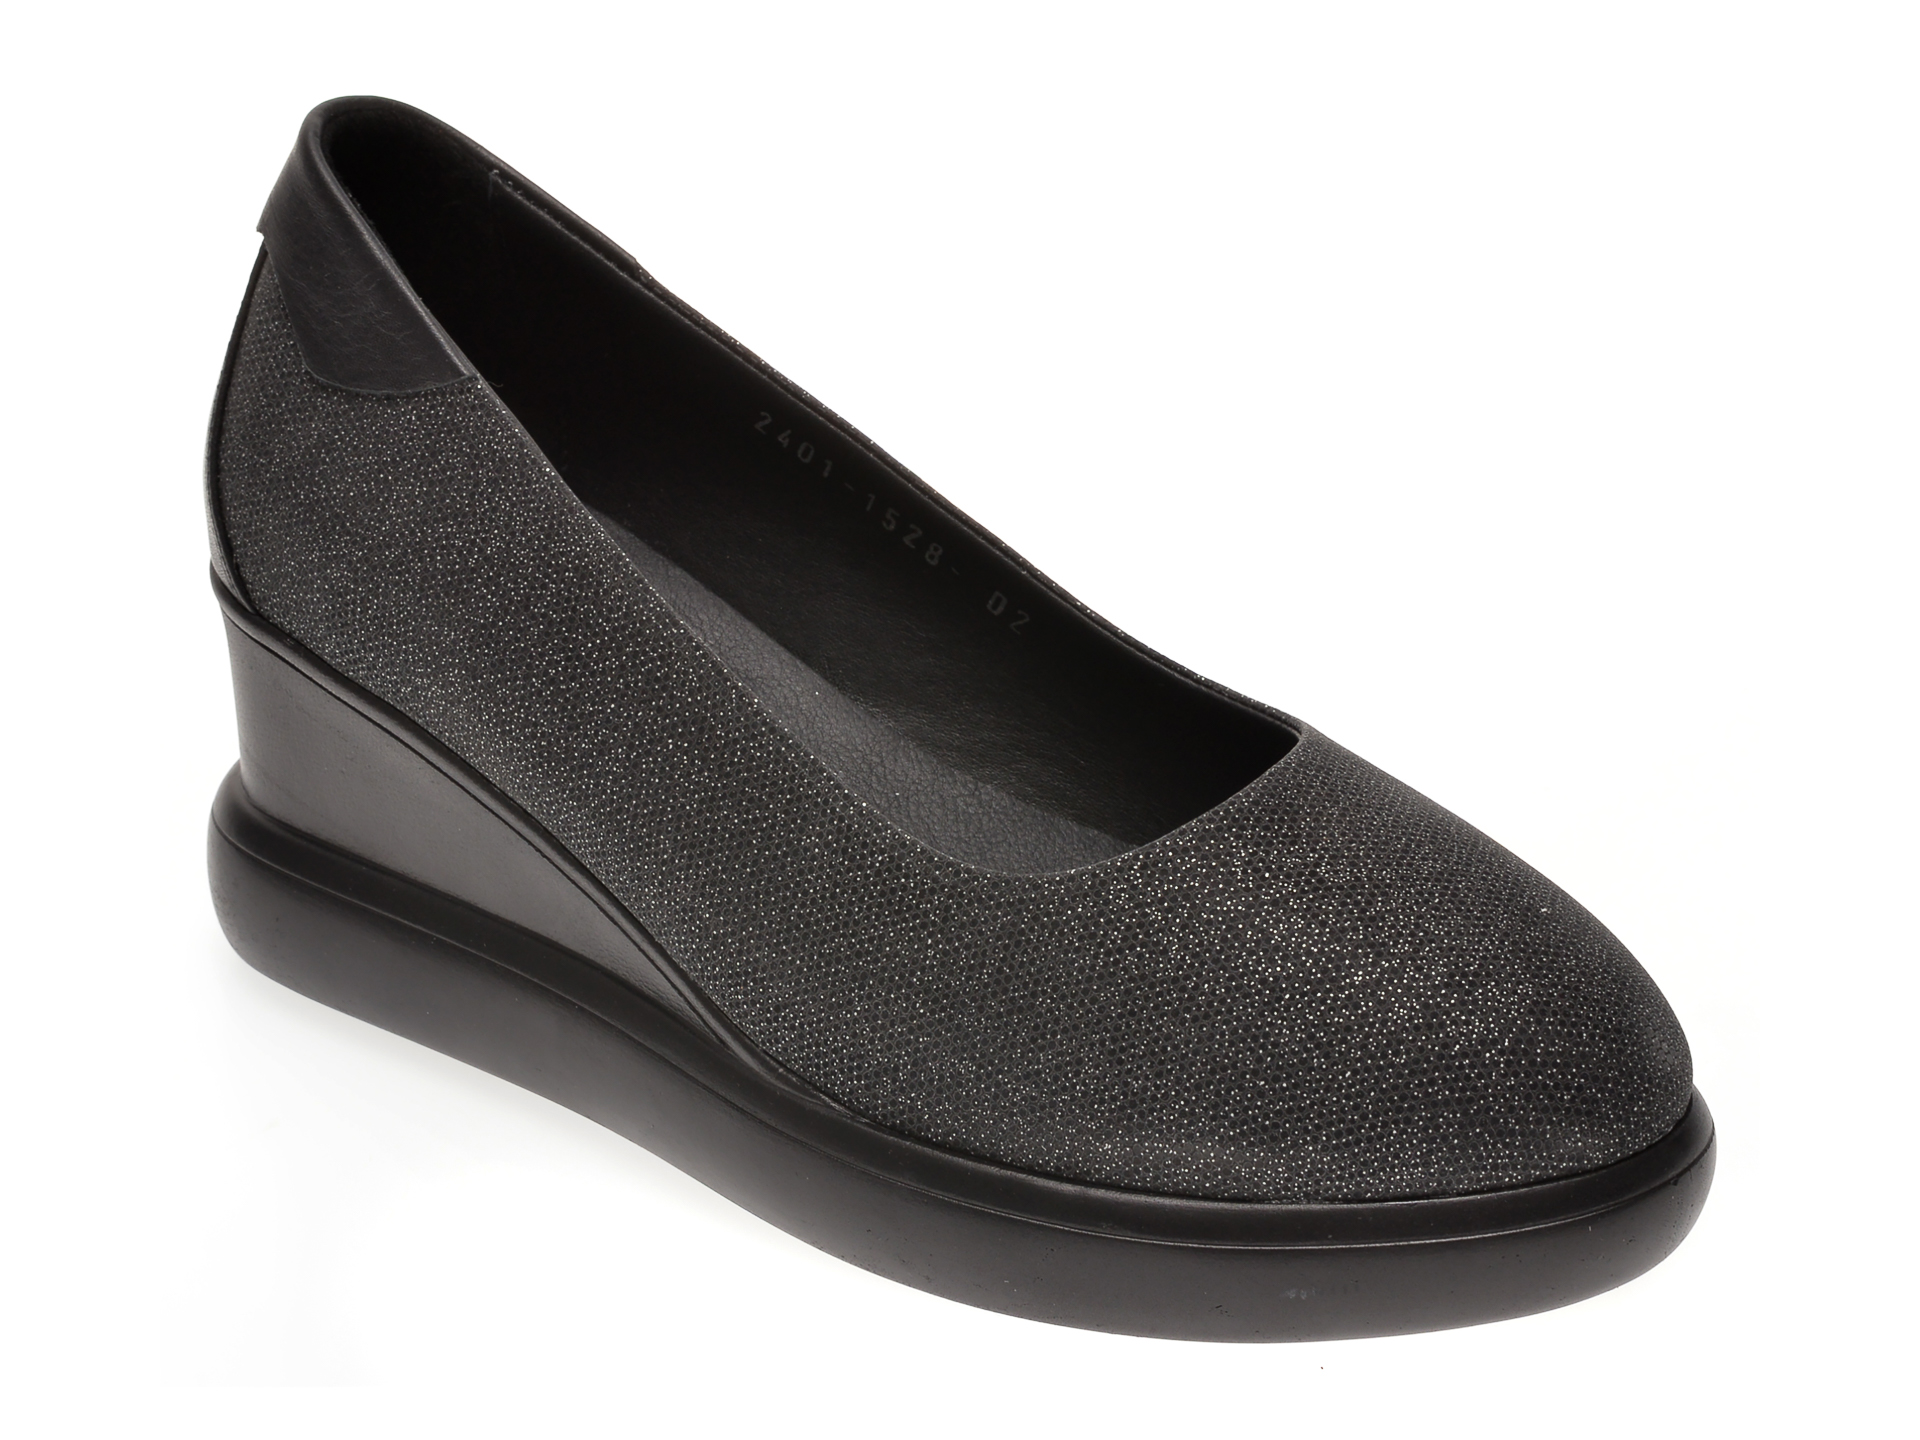 Pantofi MISS LIZA negri, 1182401, din piele naturala